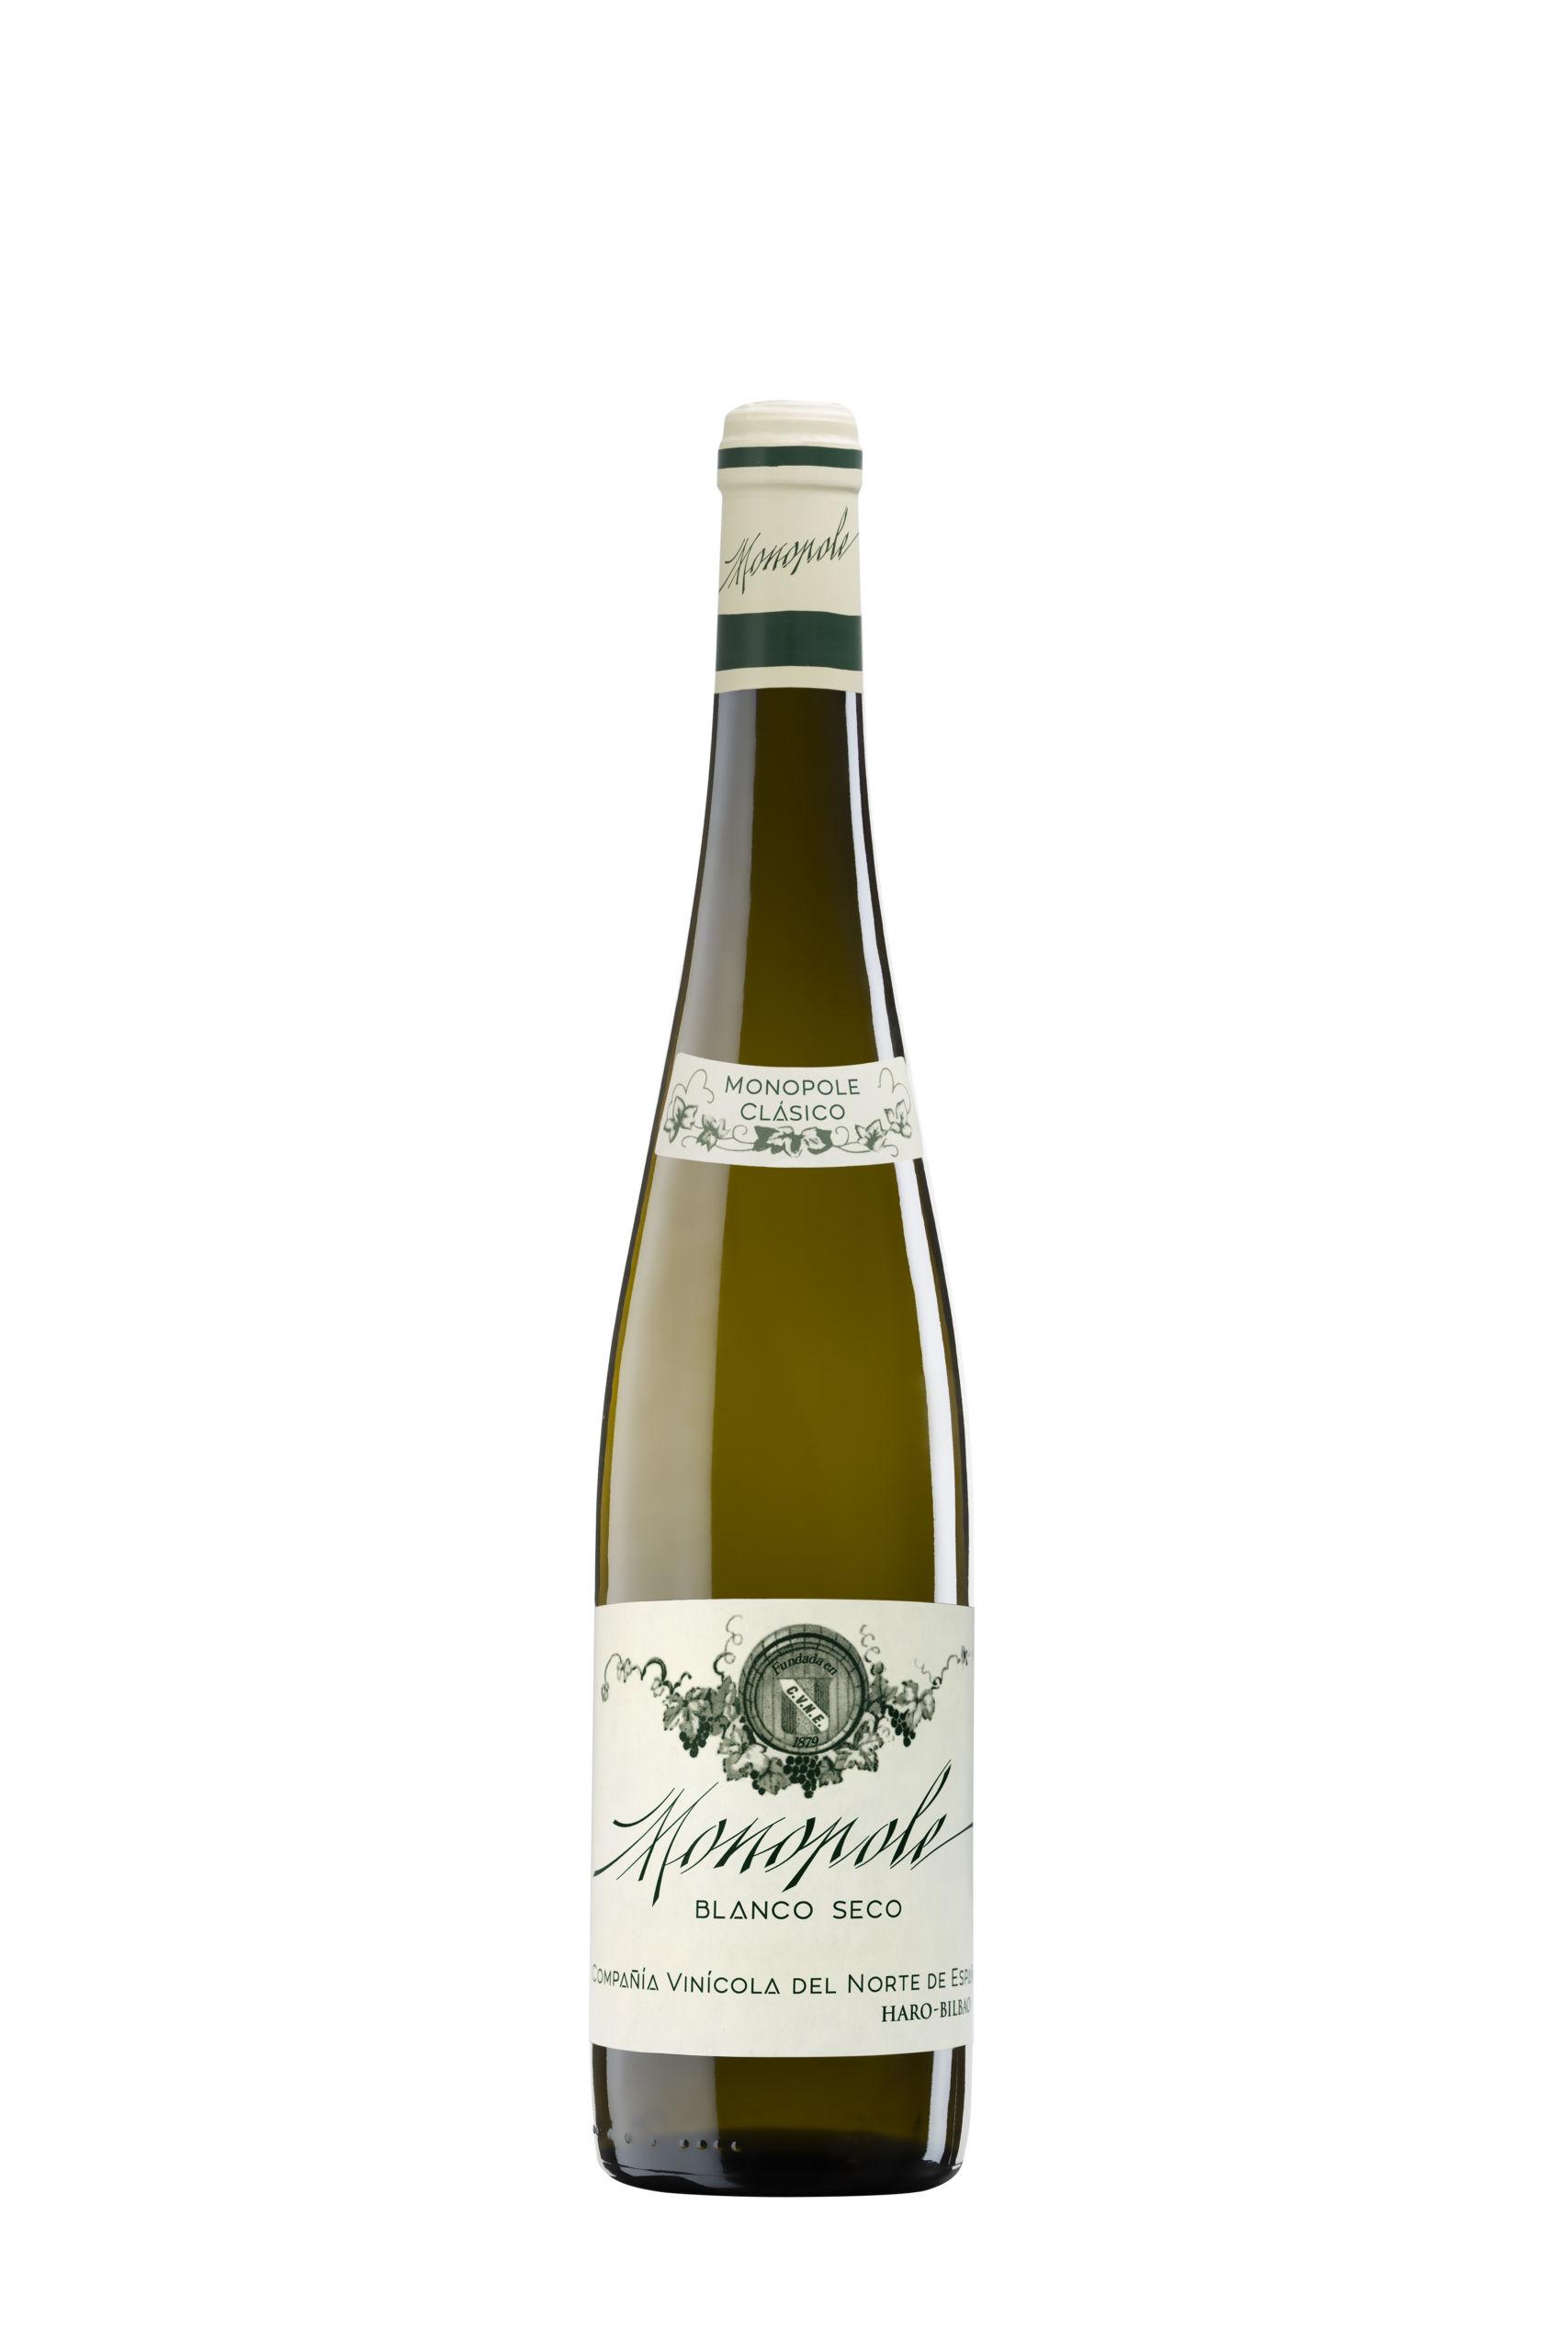 Monopole Clasico Rioja Blanco